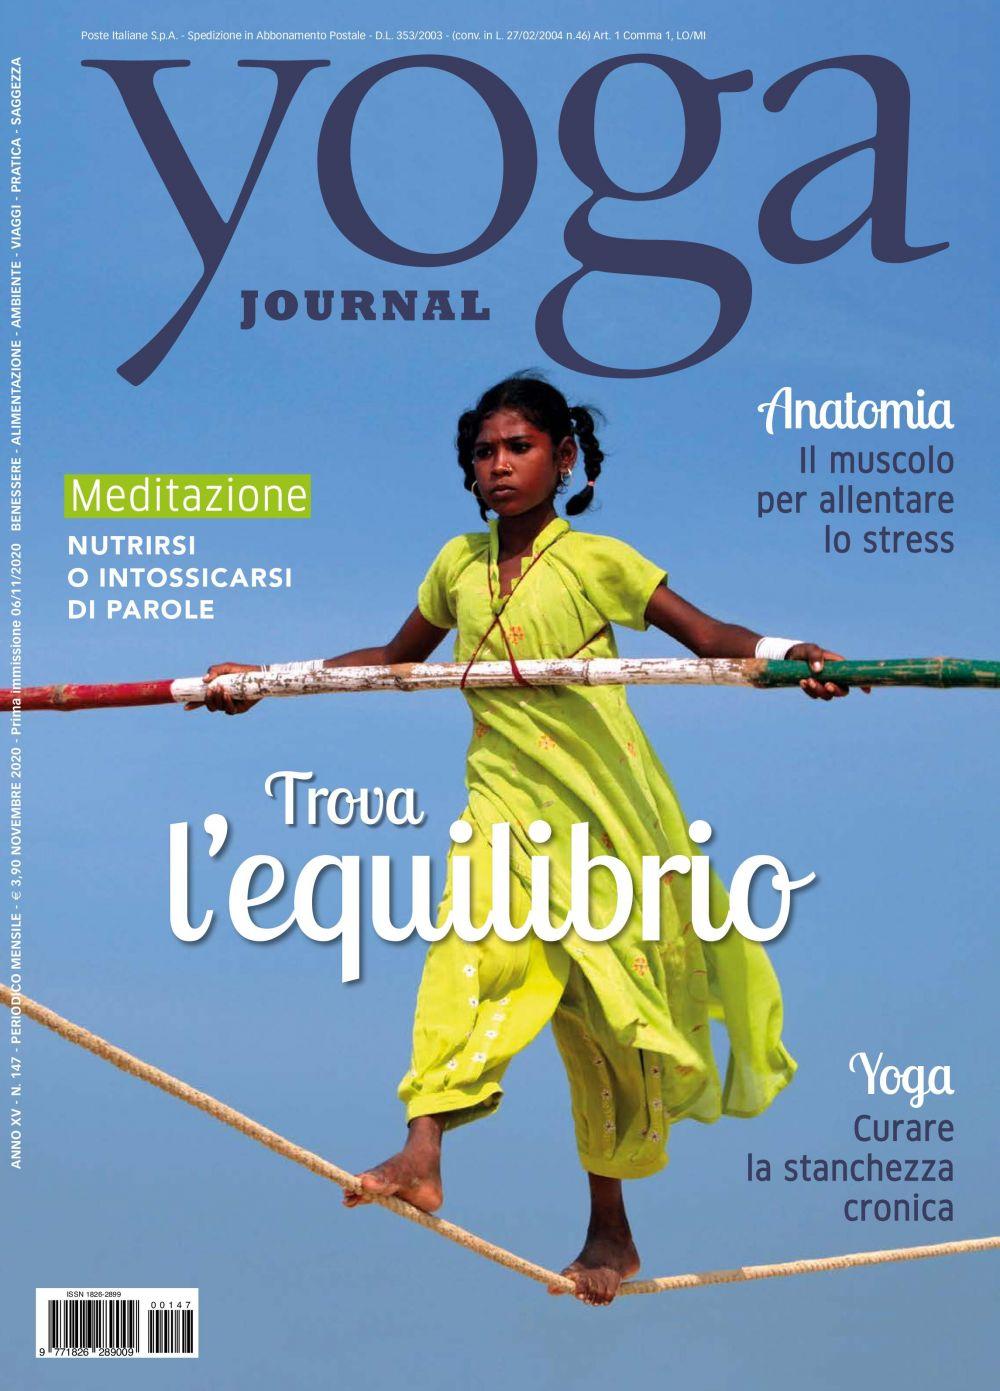 Yoga Journal Novembre n.147